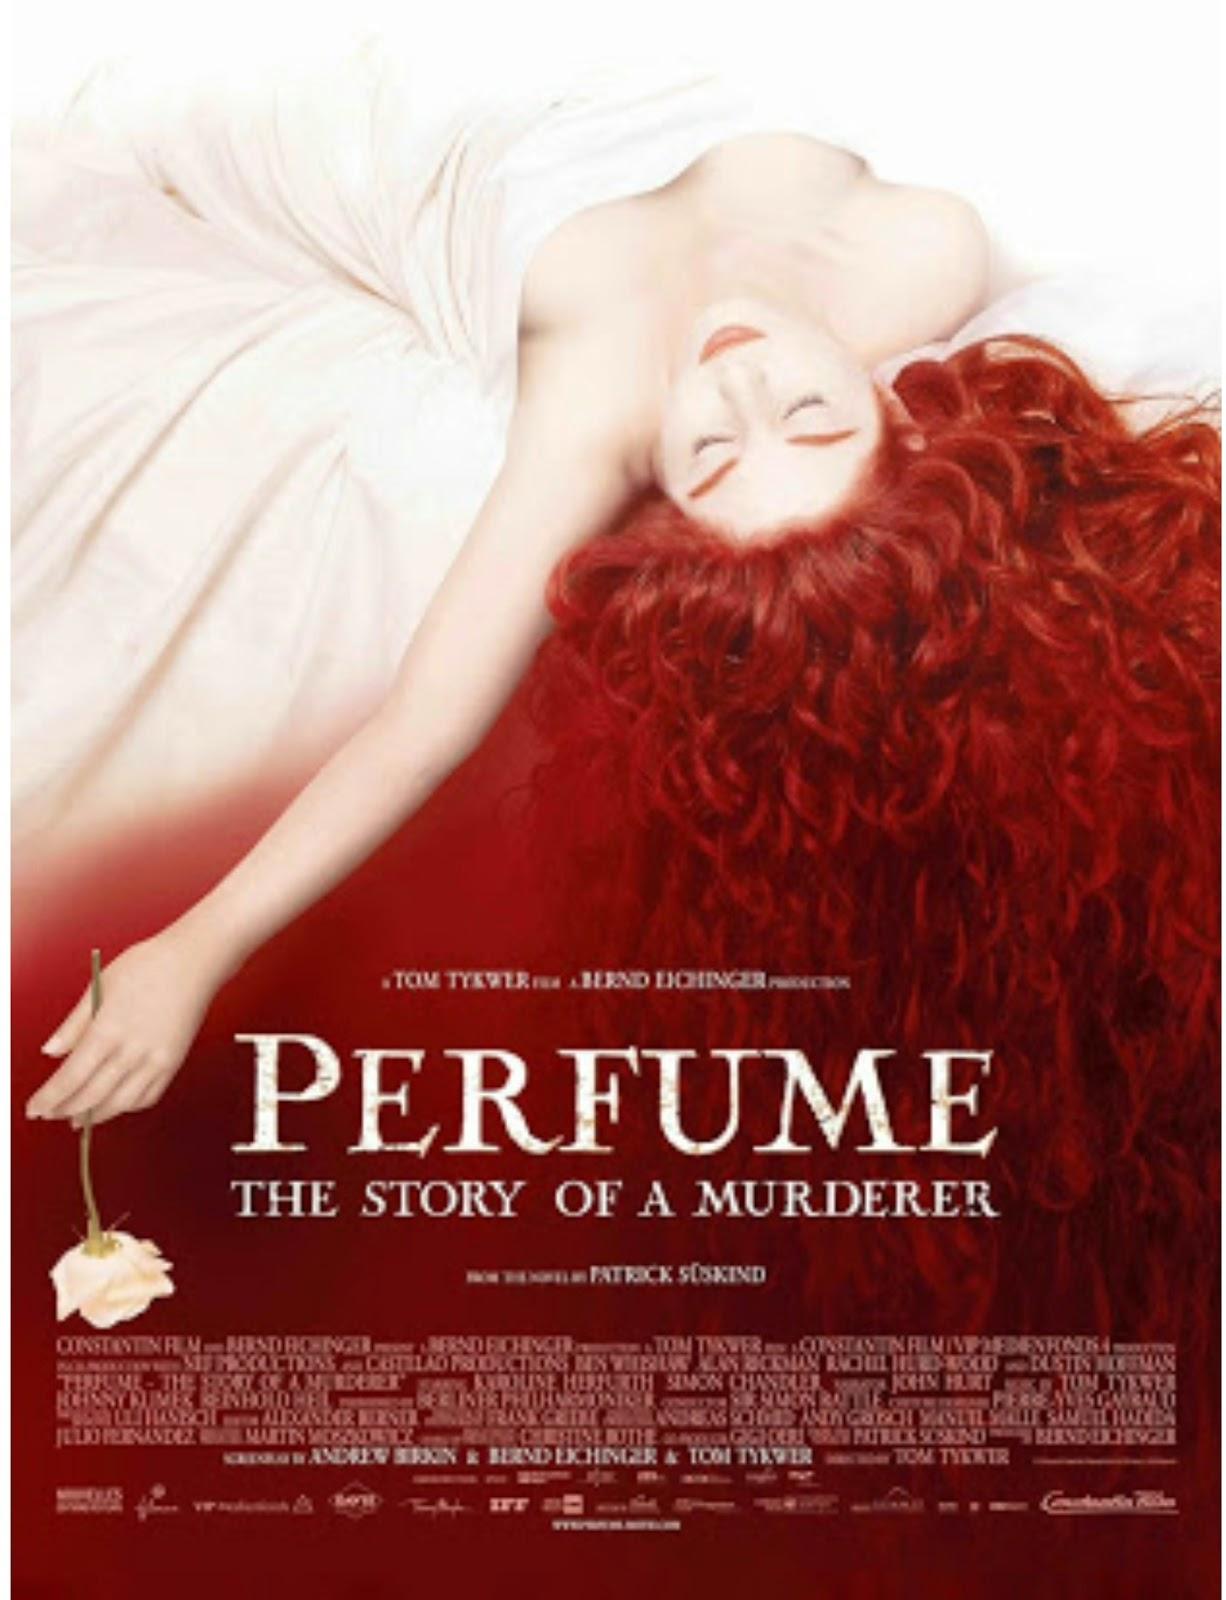 bebb18cf7 Perfume The Story of a Murderer العطر: قصة قاتل